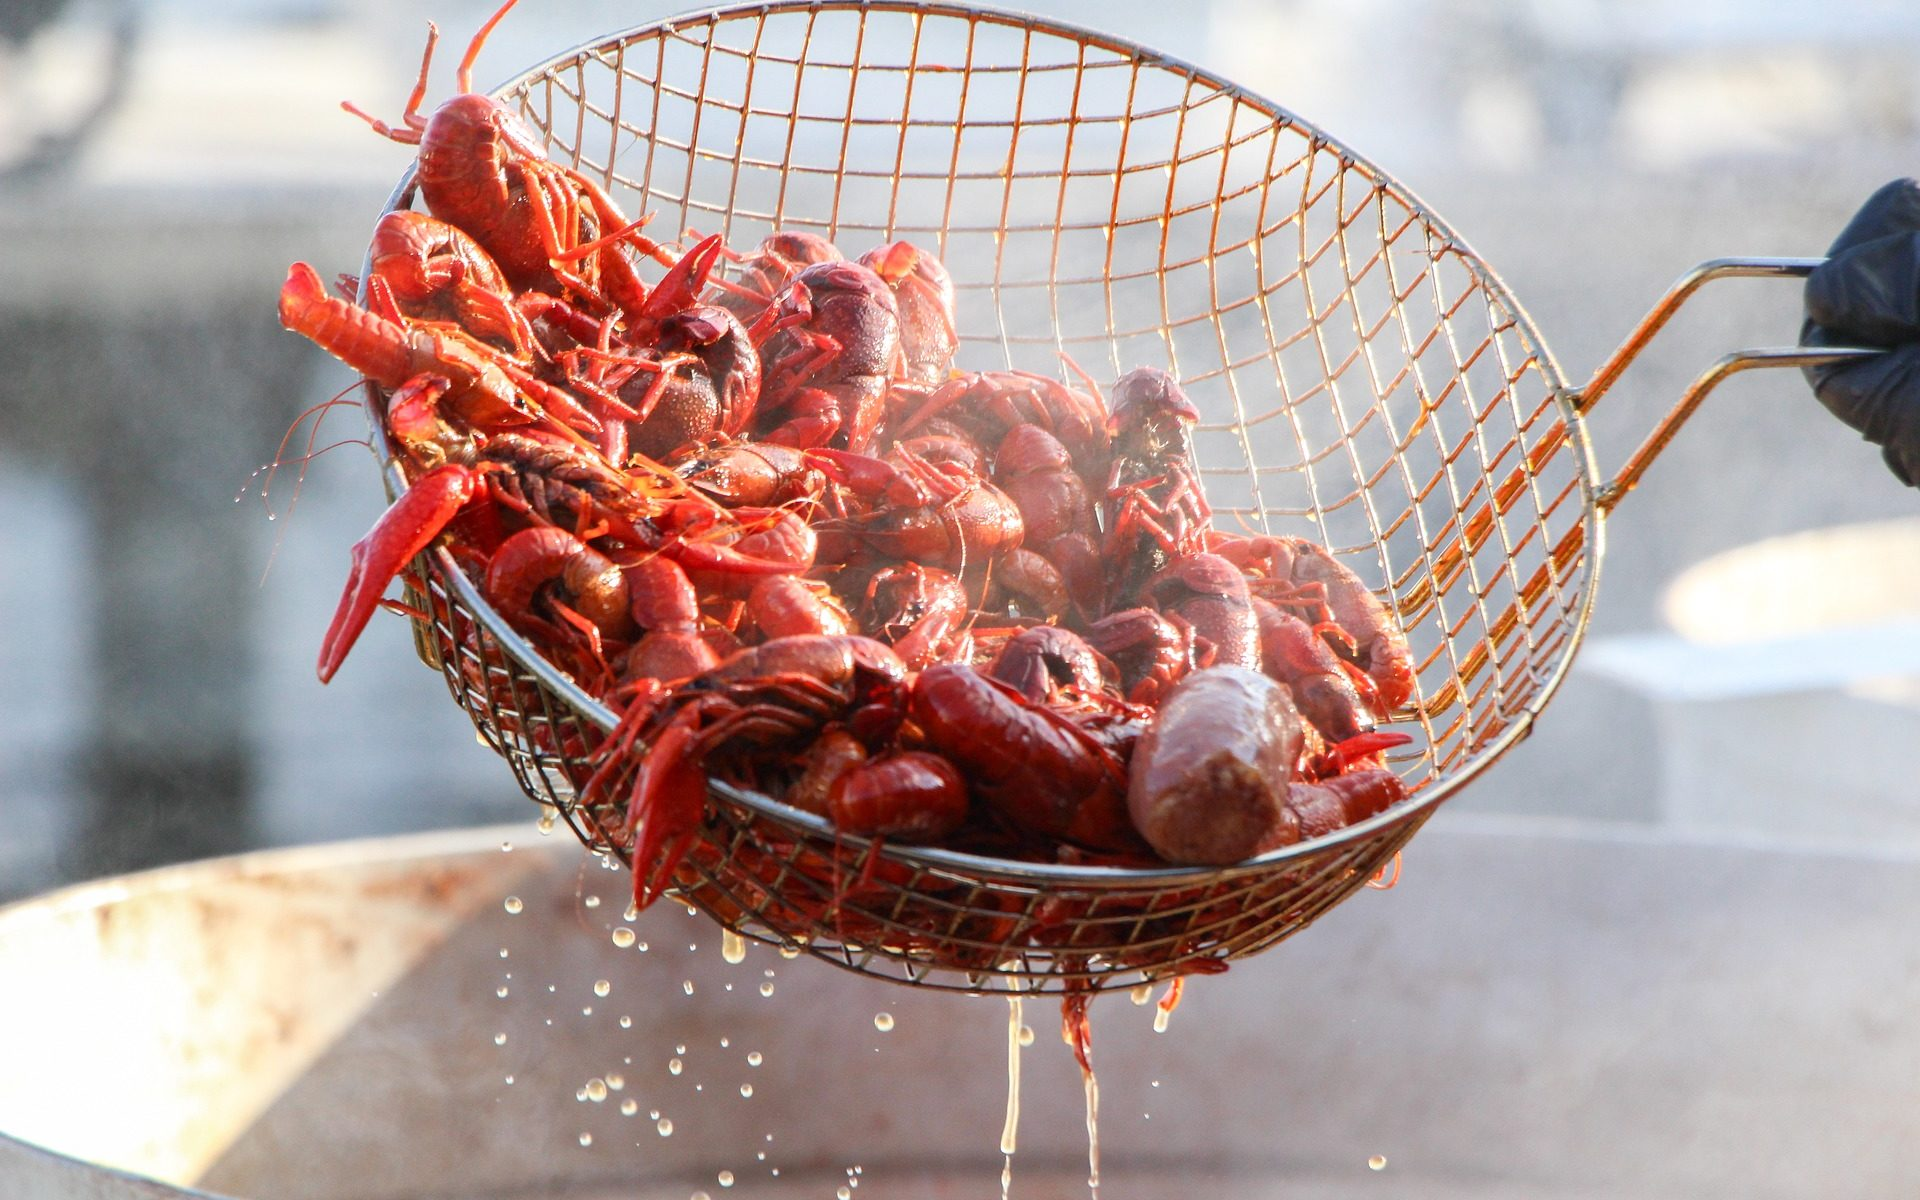 crawfish krebse 1920x1200 - Hunger: Wir wollen Cajun Crawfish (Flusskrebse)